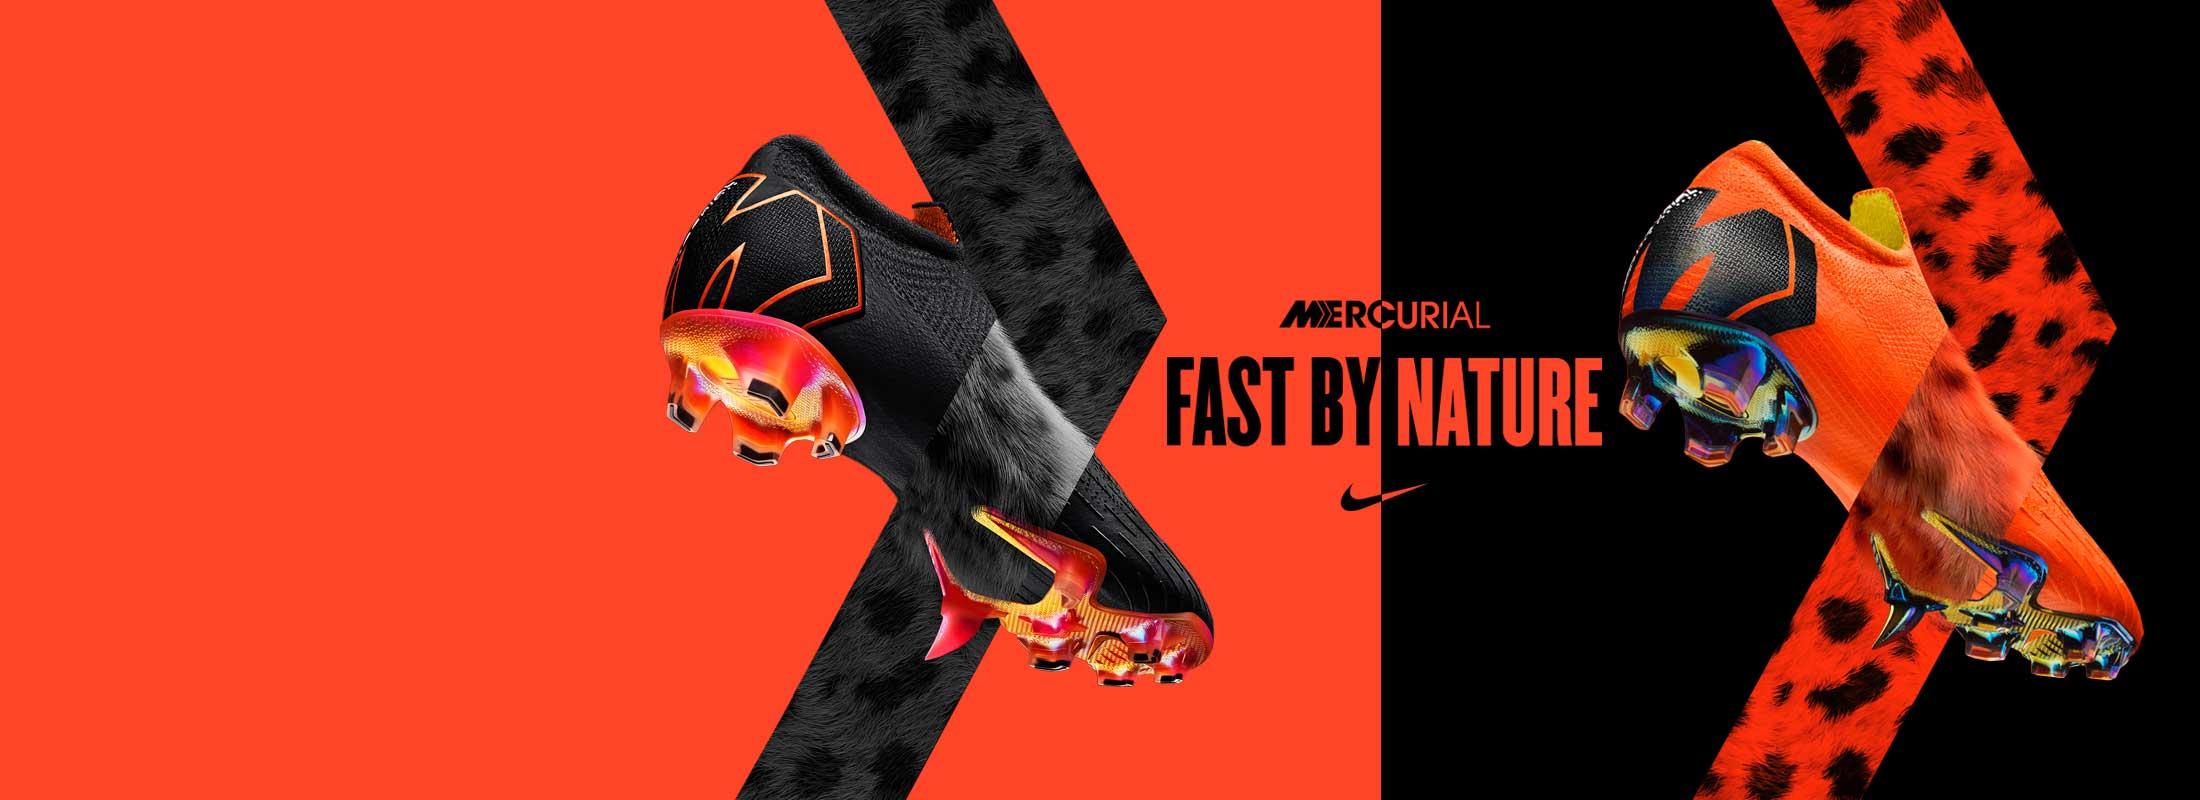 Nuevas Nike Mercurial niño